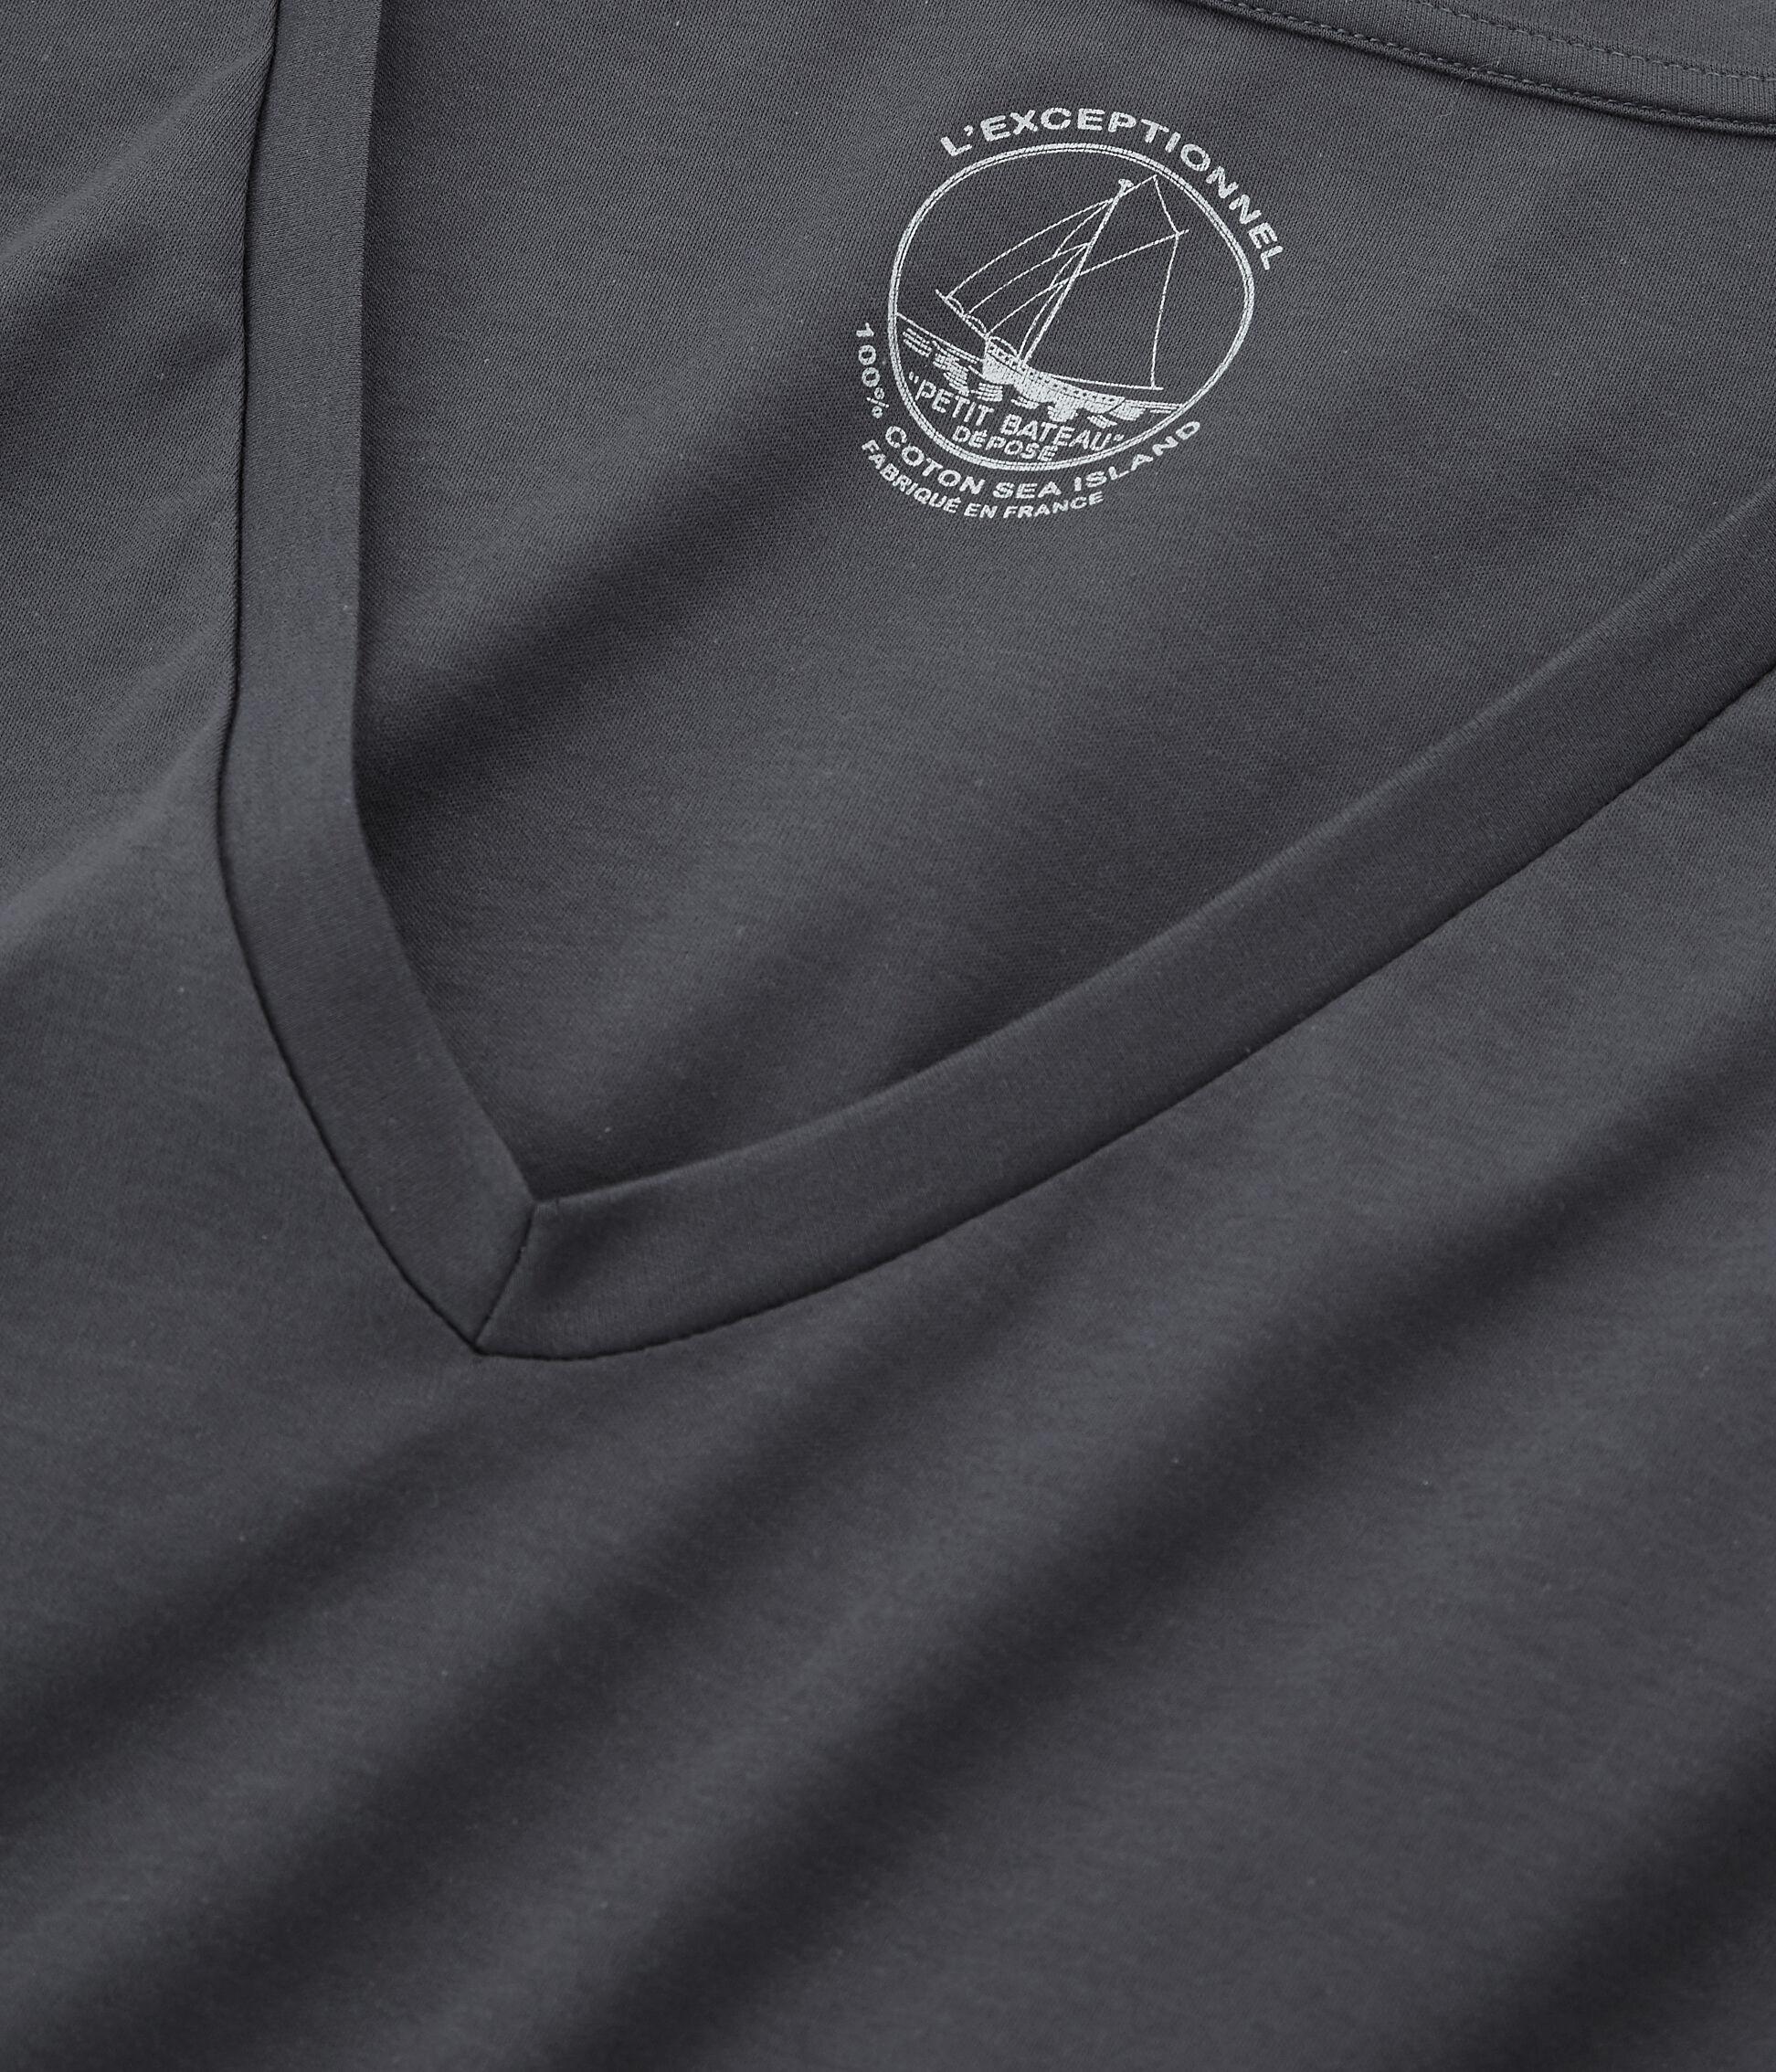 Para De Sea Bateau Camiseta Algodón MujerPetit Manga Larga Island dBeCxor